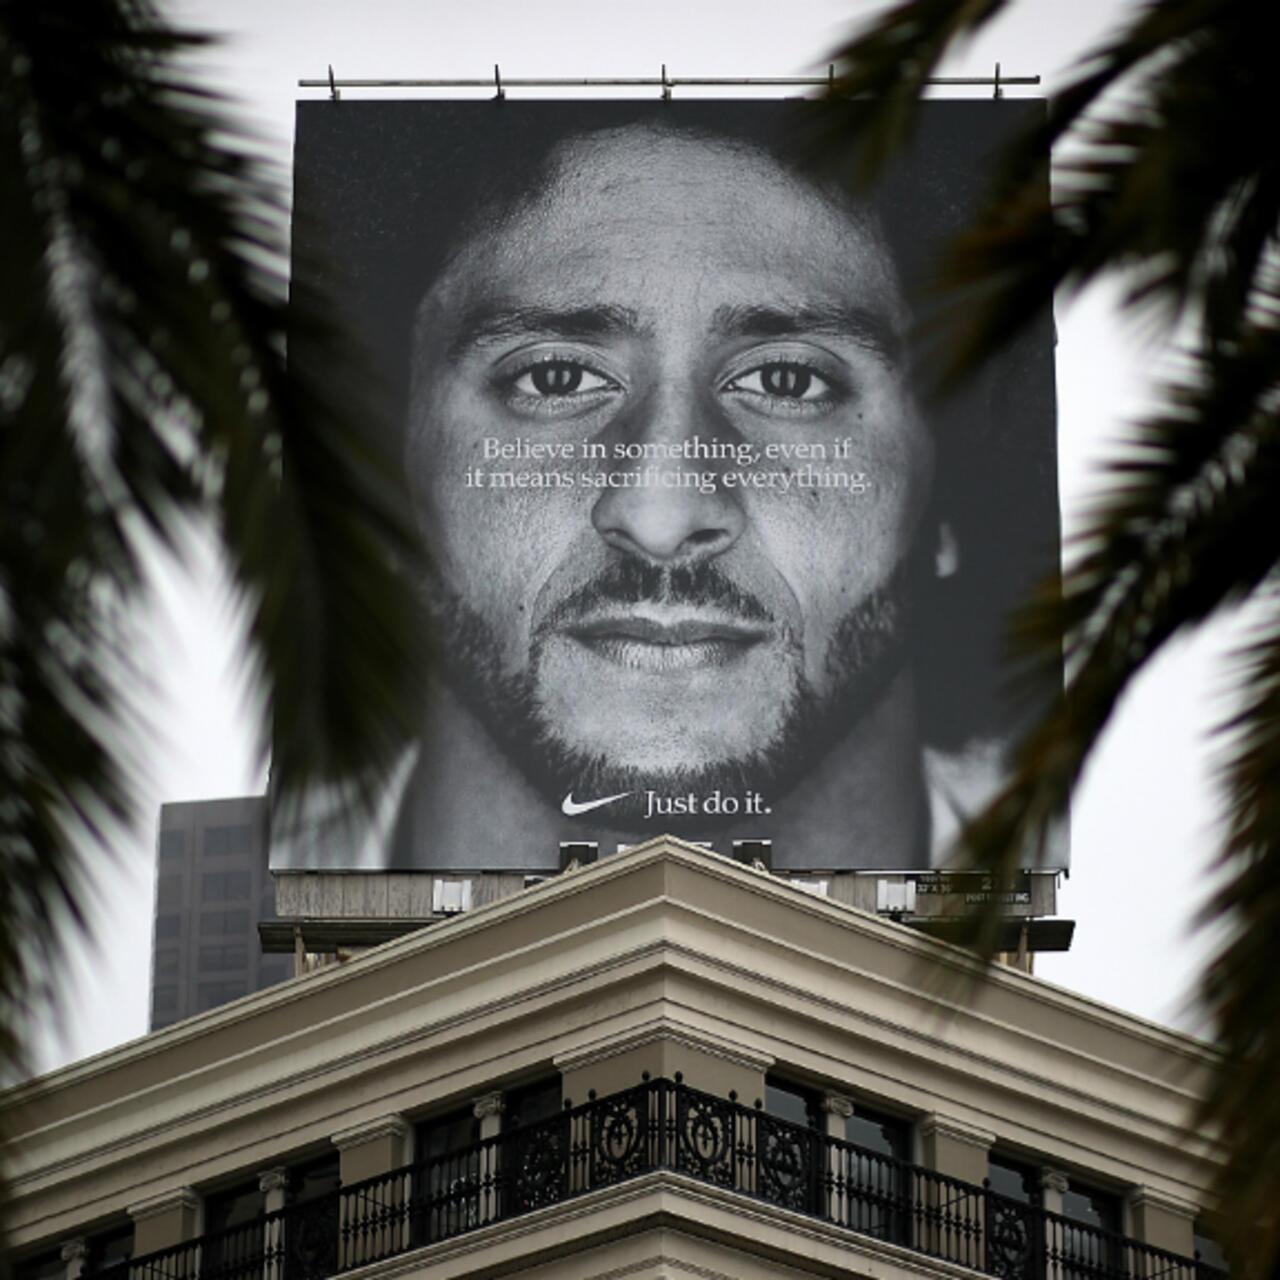 Trump Lebron James Wade Into Row Over Nike S Kaepernick Ad